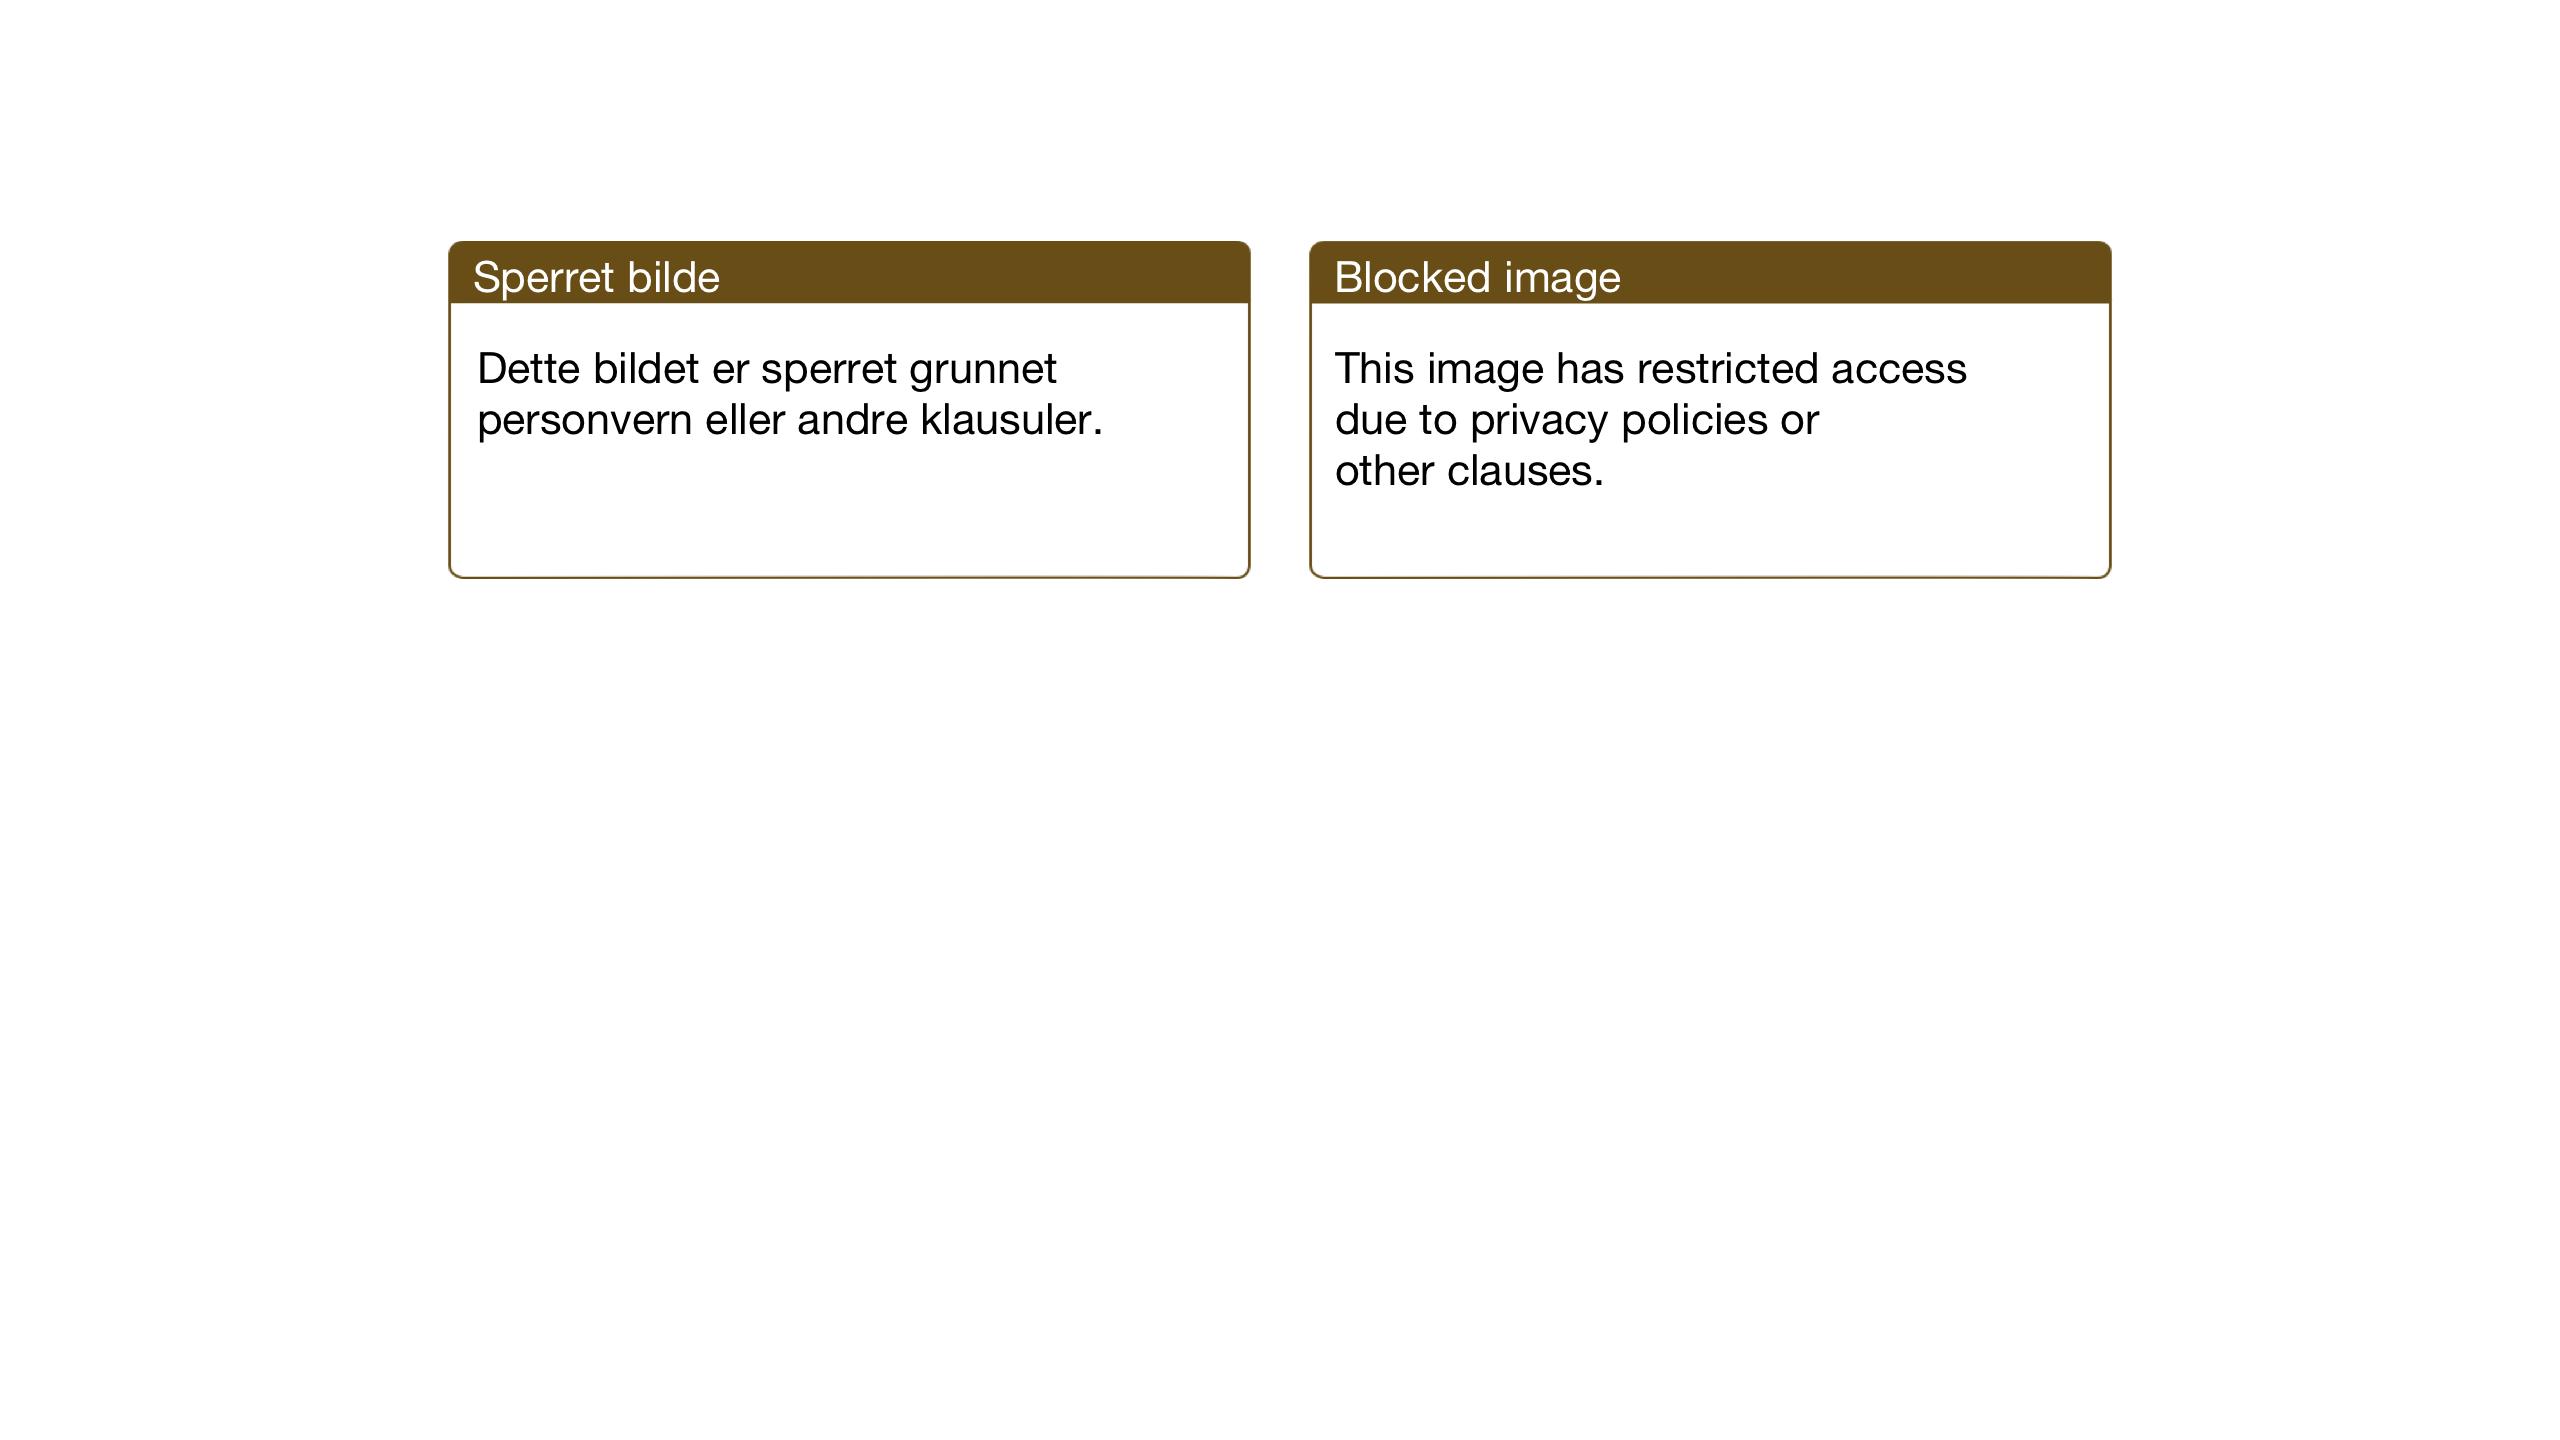 SAT, Ministerialprotokoller, klokkerbøker og fødselsregistre - Nordland, 847/L0680: Klokkerbok nr. 847C08, 1930-1947, s. 190